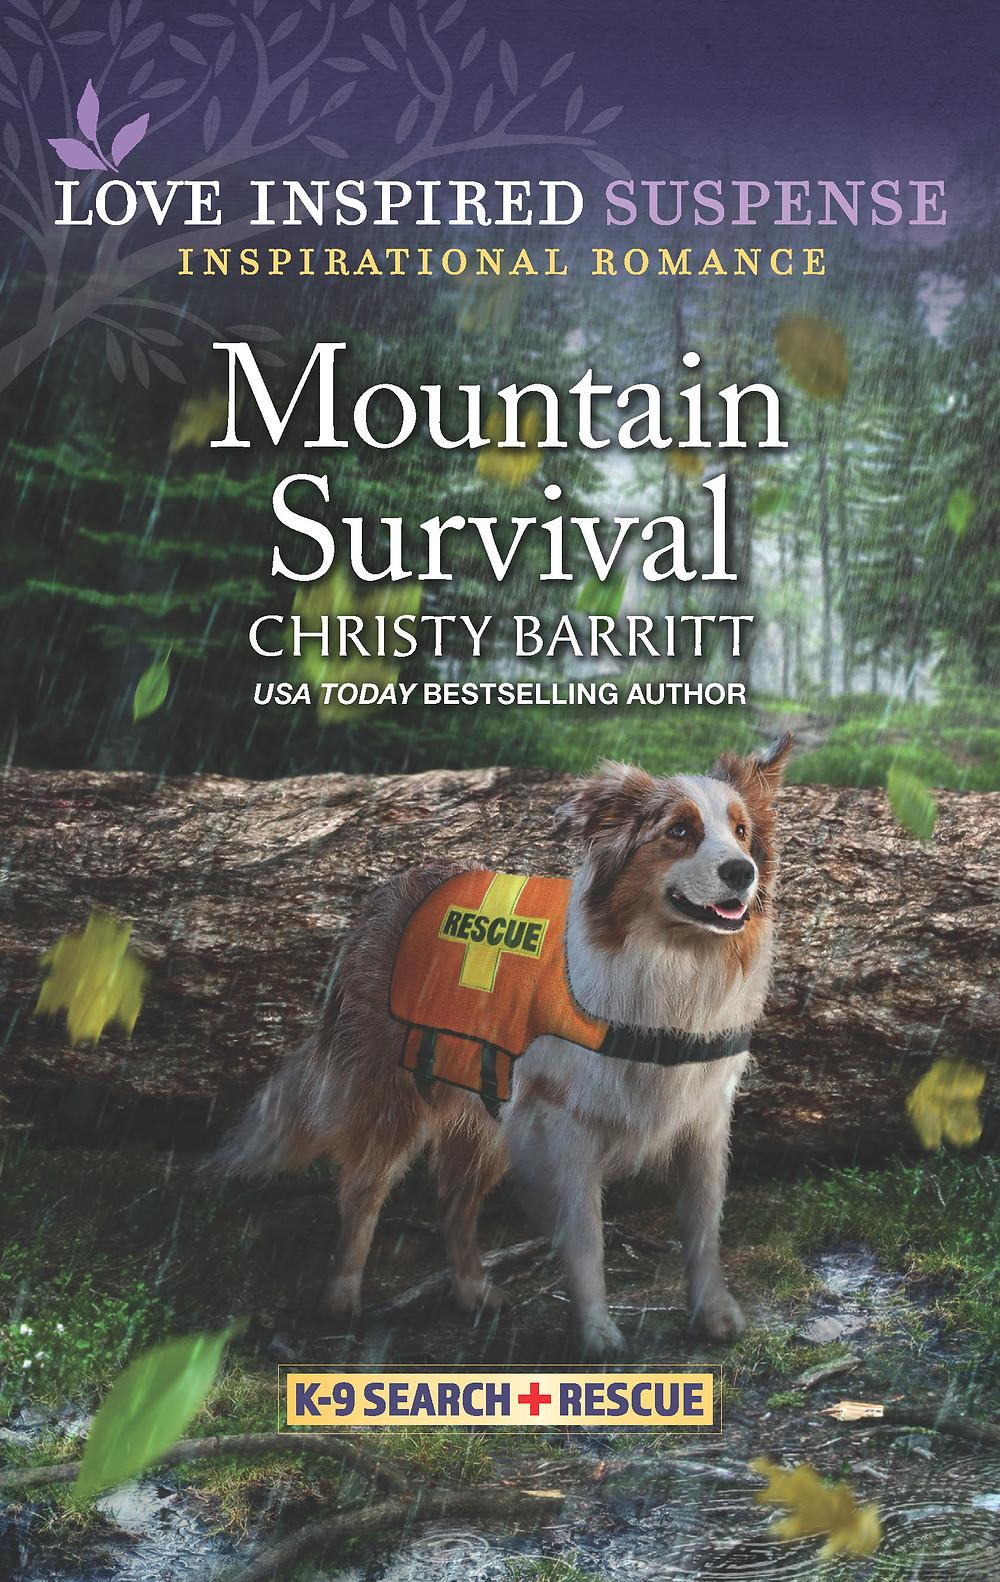 Mountain Survival, a Love Inspired Suspense novel by Christy Barritt